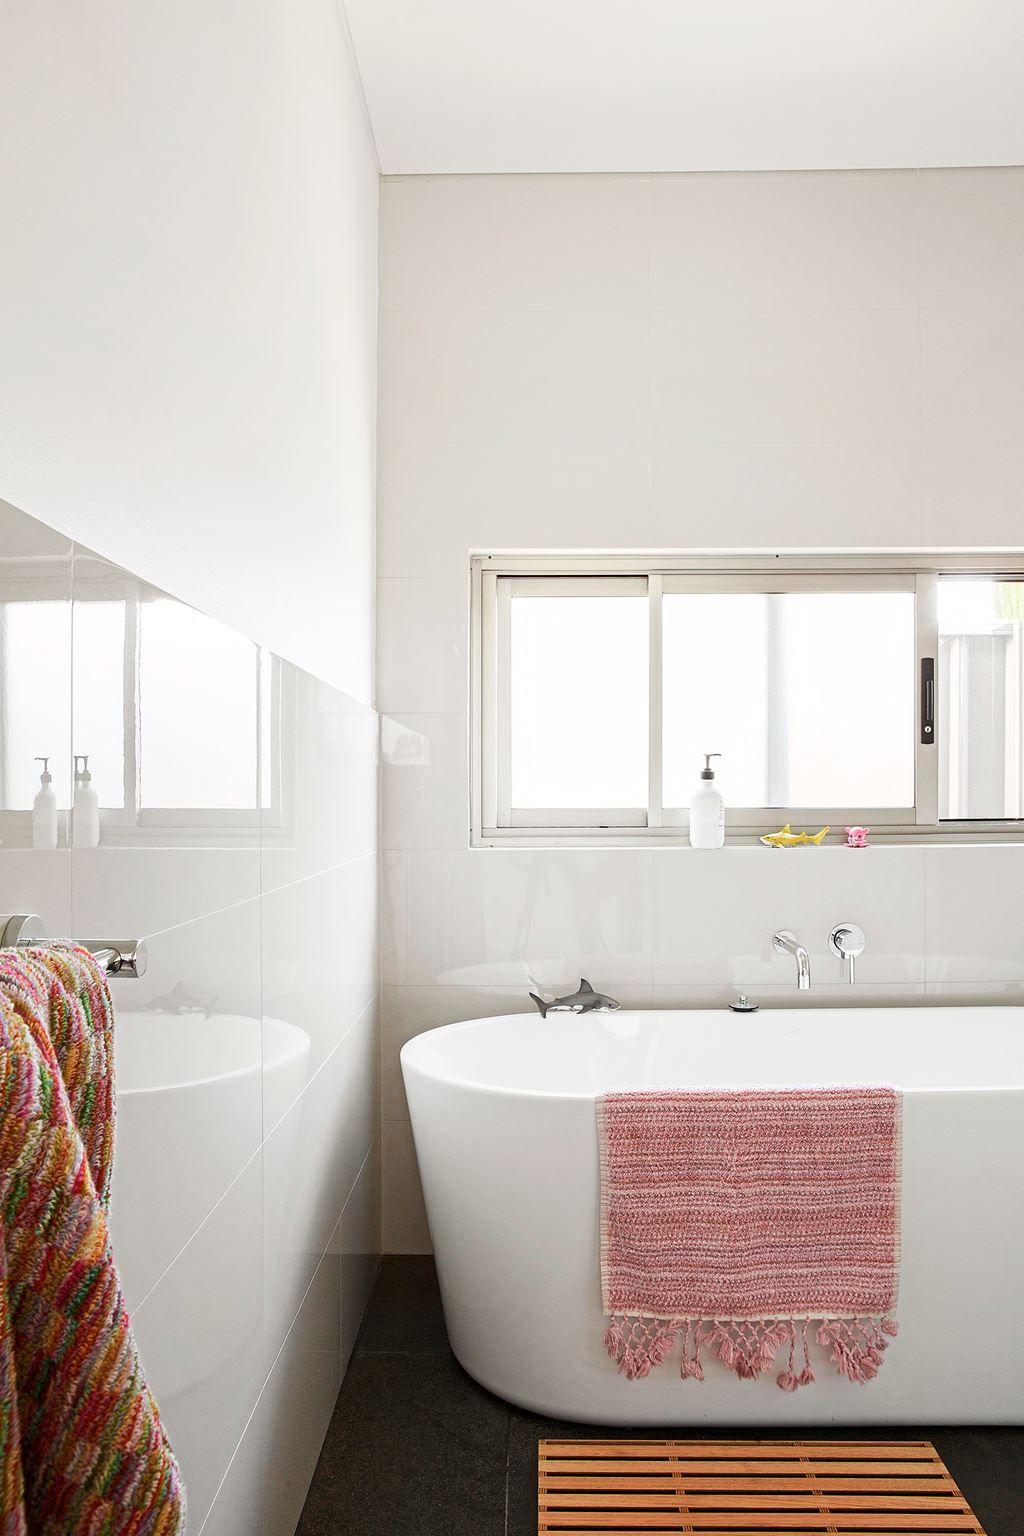 Pin by Juliet Poletan on Bathrooms/Ensuites   Pinterest